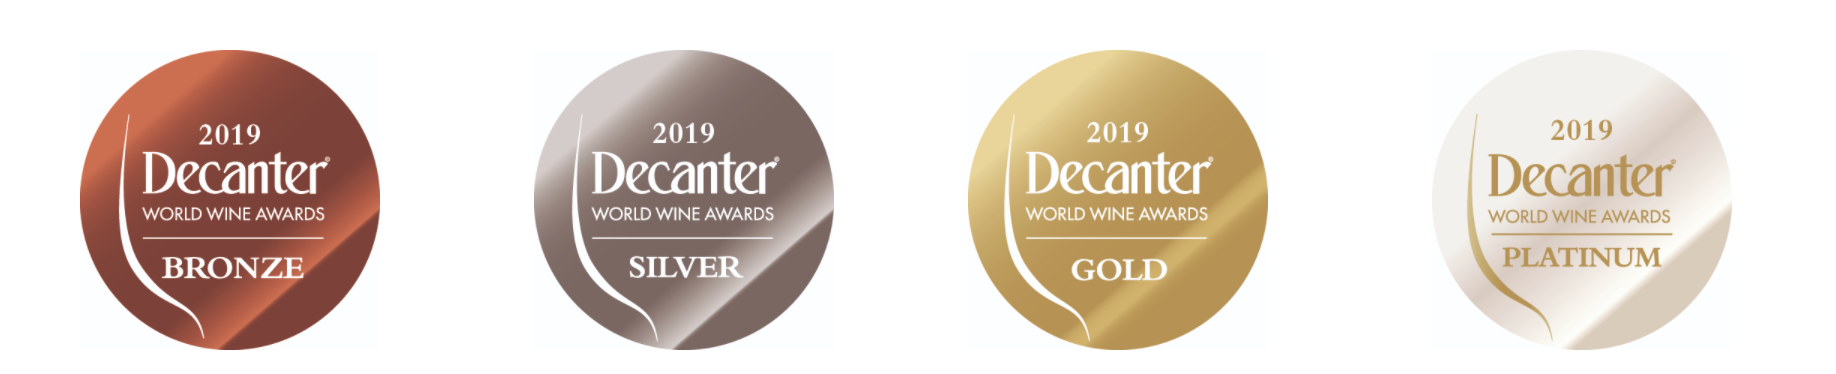 Decanter Awards labels